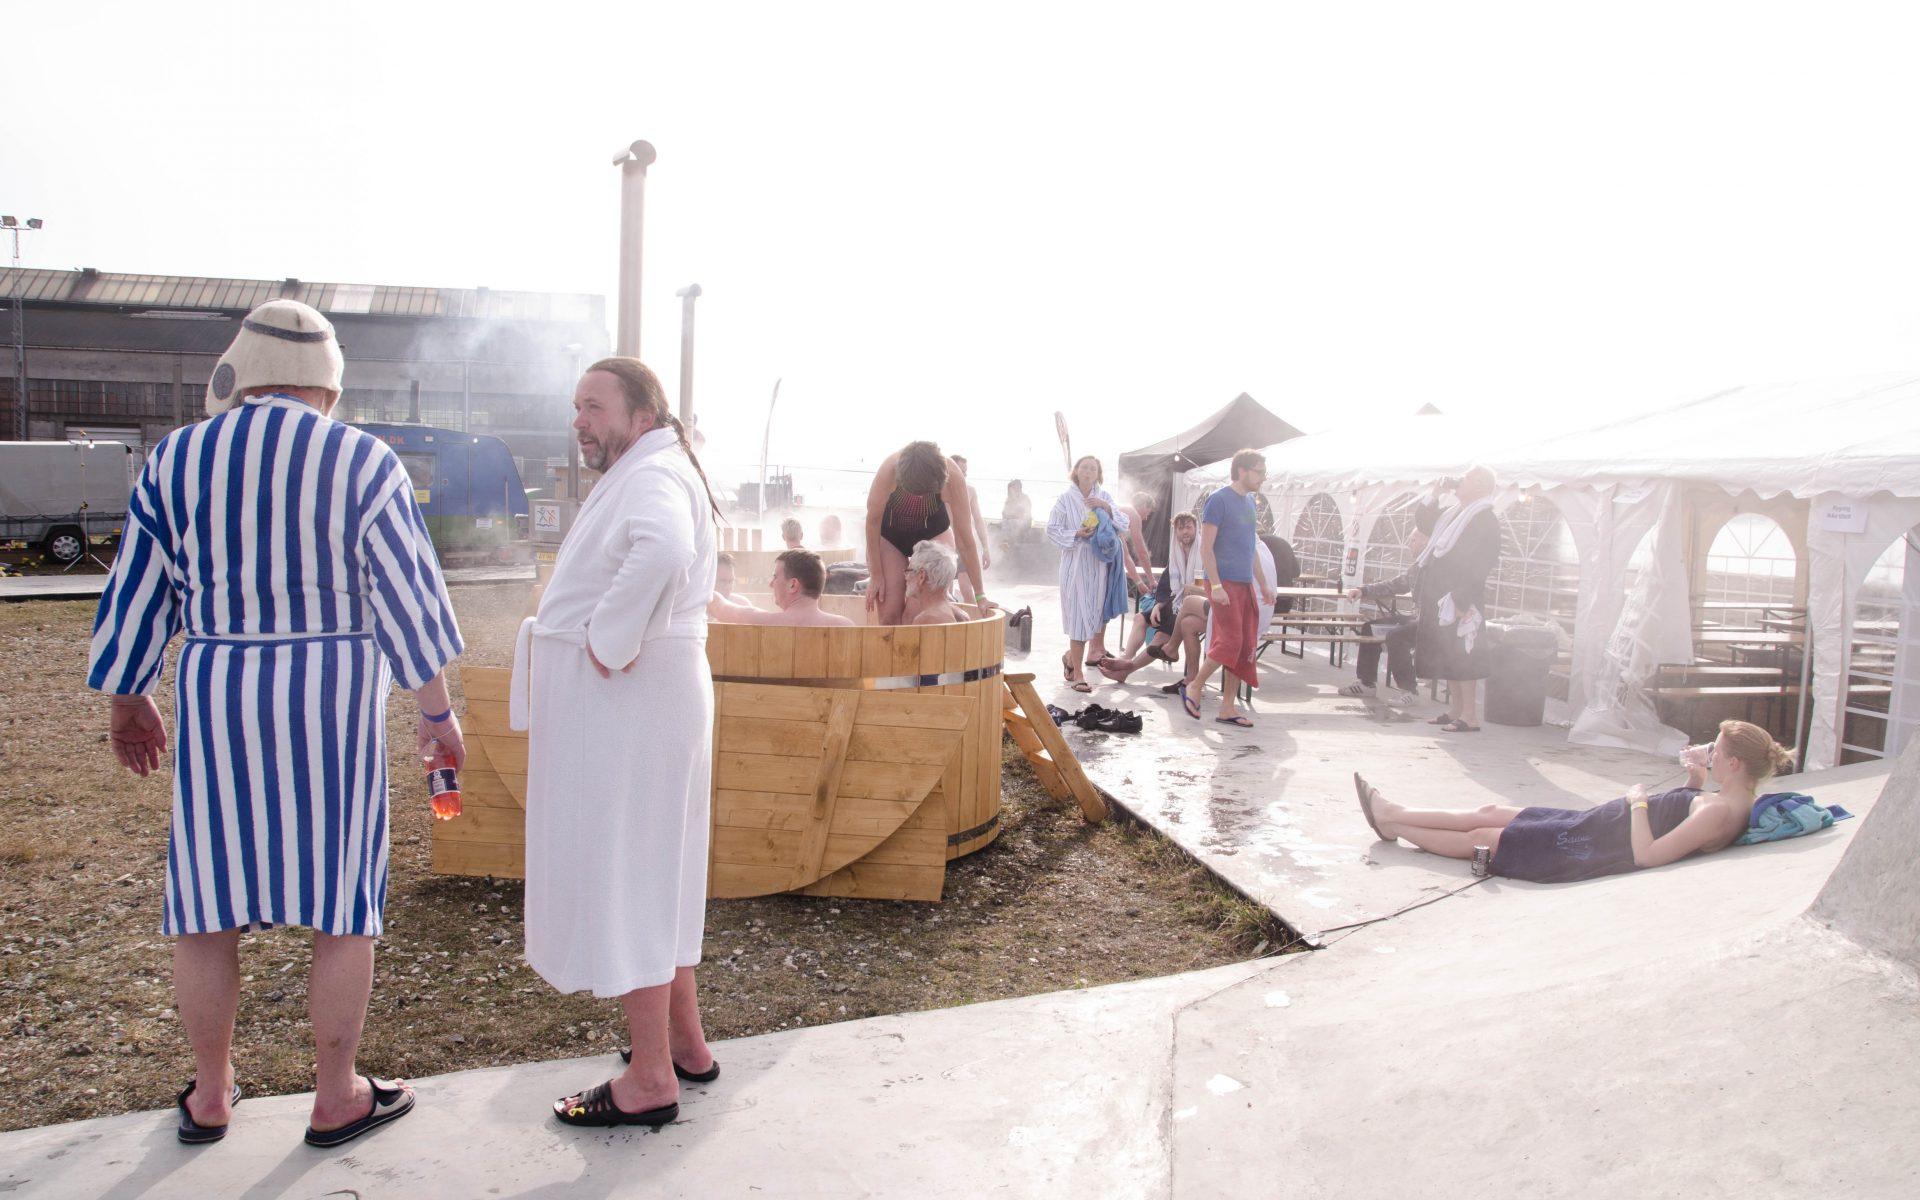 kulturhavn365_sauna-event02